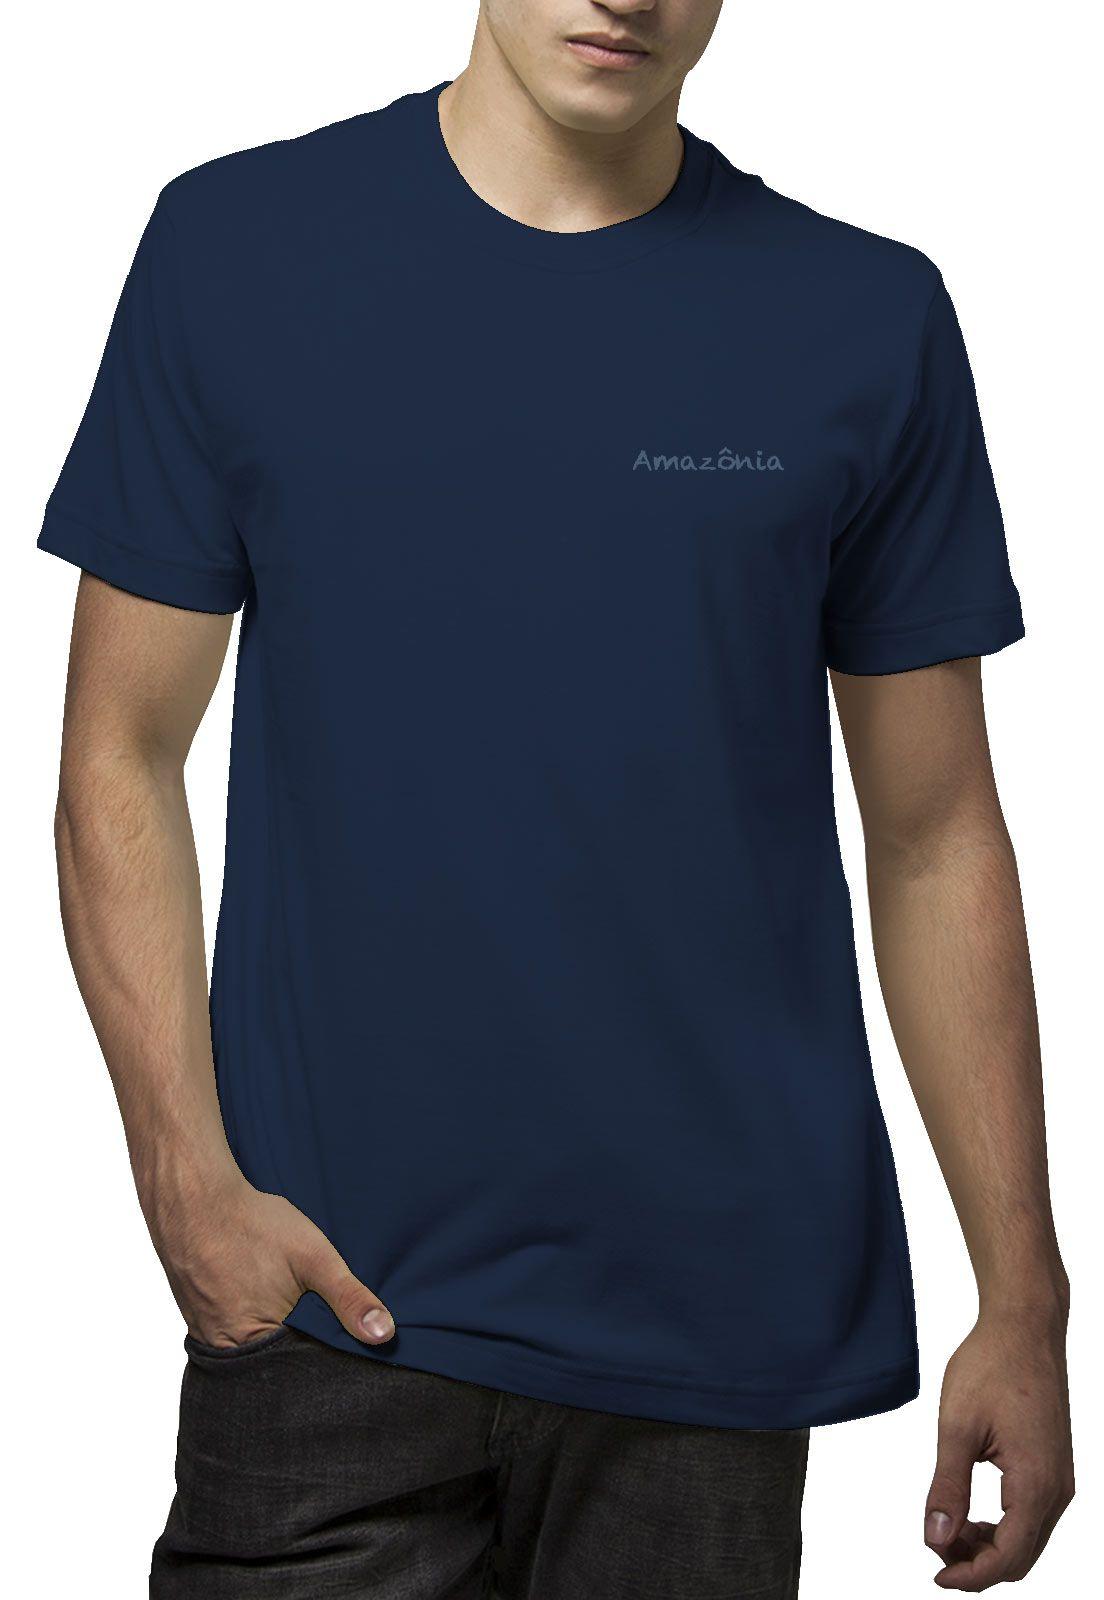 Camiseta Amazônia Tucano Noite - Azul Escuro